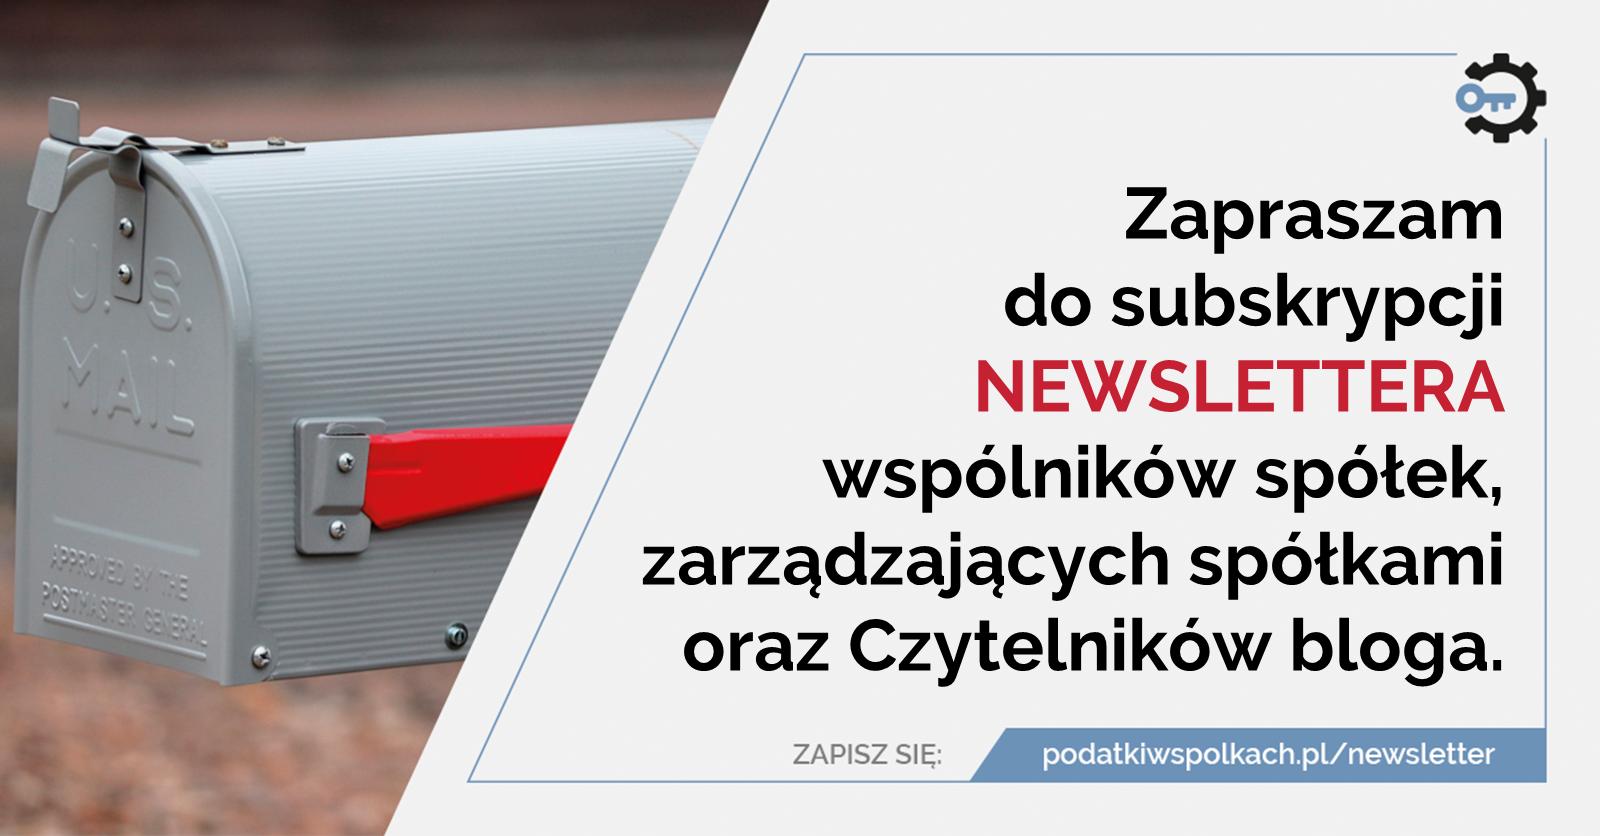 Newsletter bloga podatkiwspolkach.pl